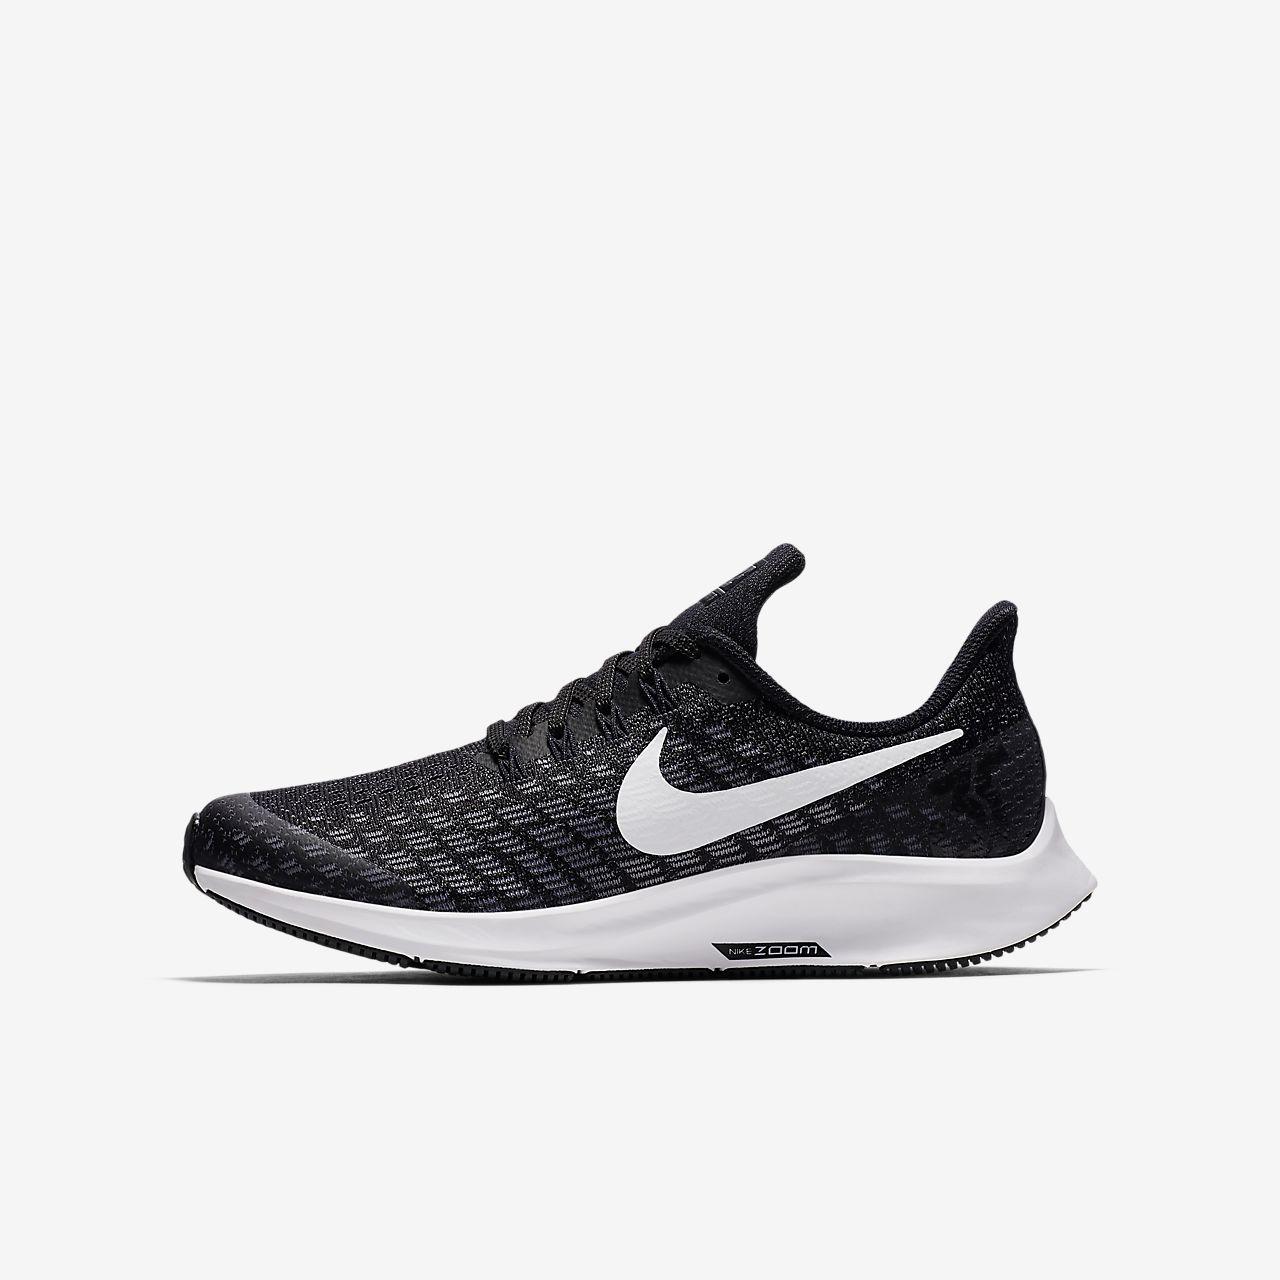 6c75e6403bc5 Nike Air Zoom Pegasus 35 Younger Older Kids  Running Shoe. Nike.com AU